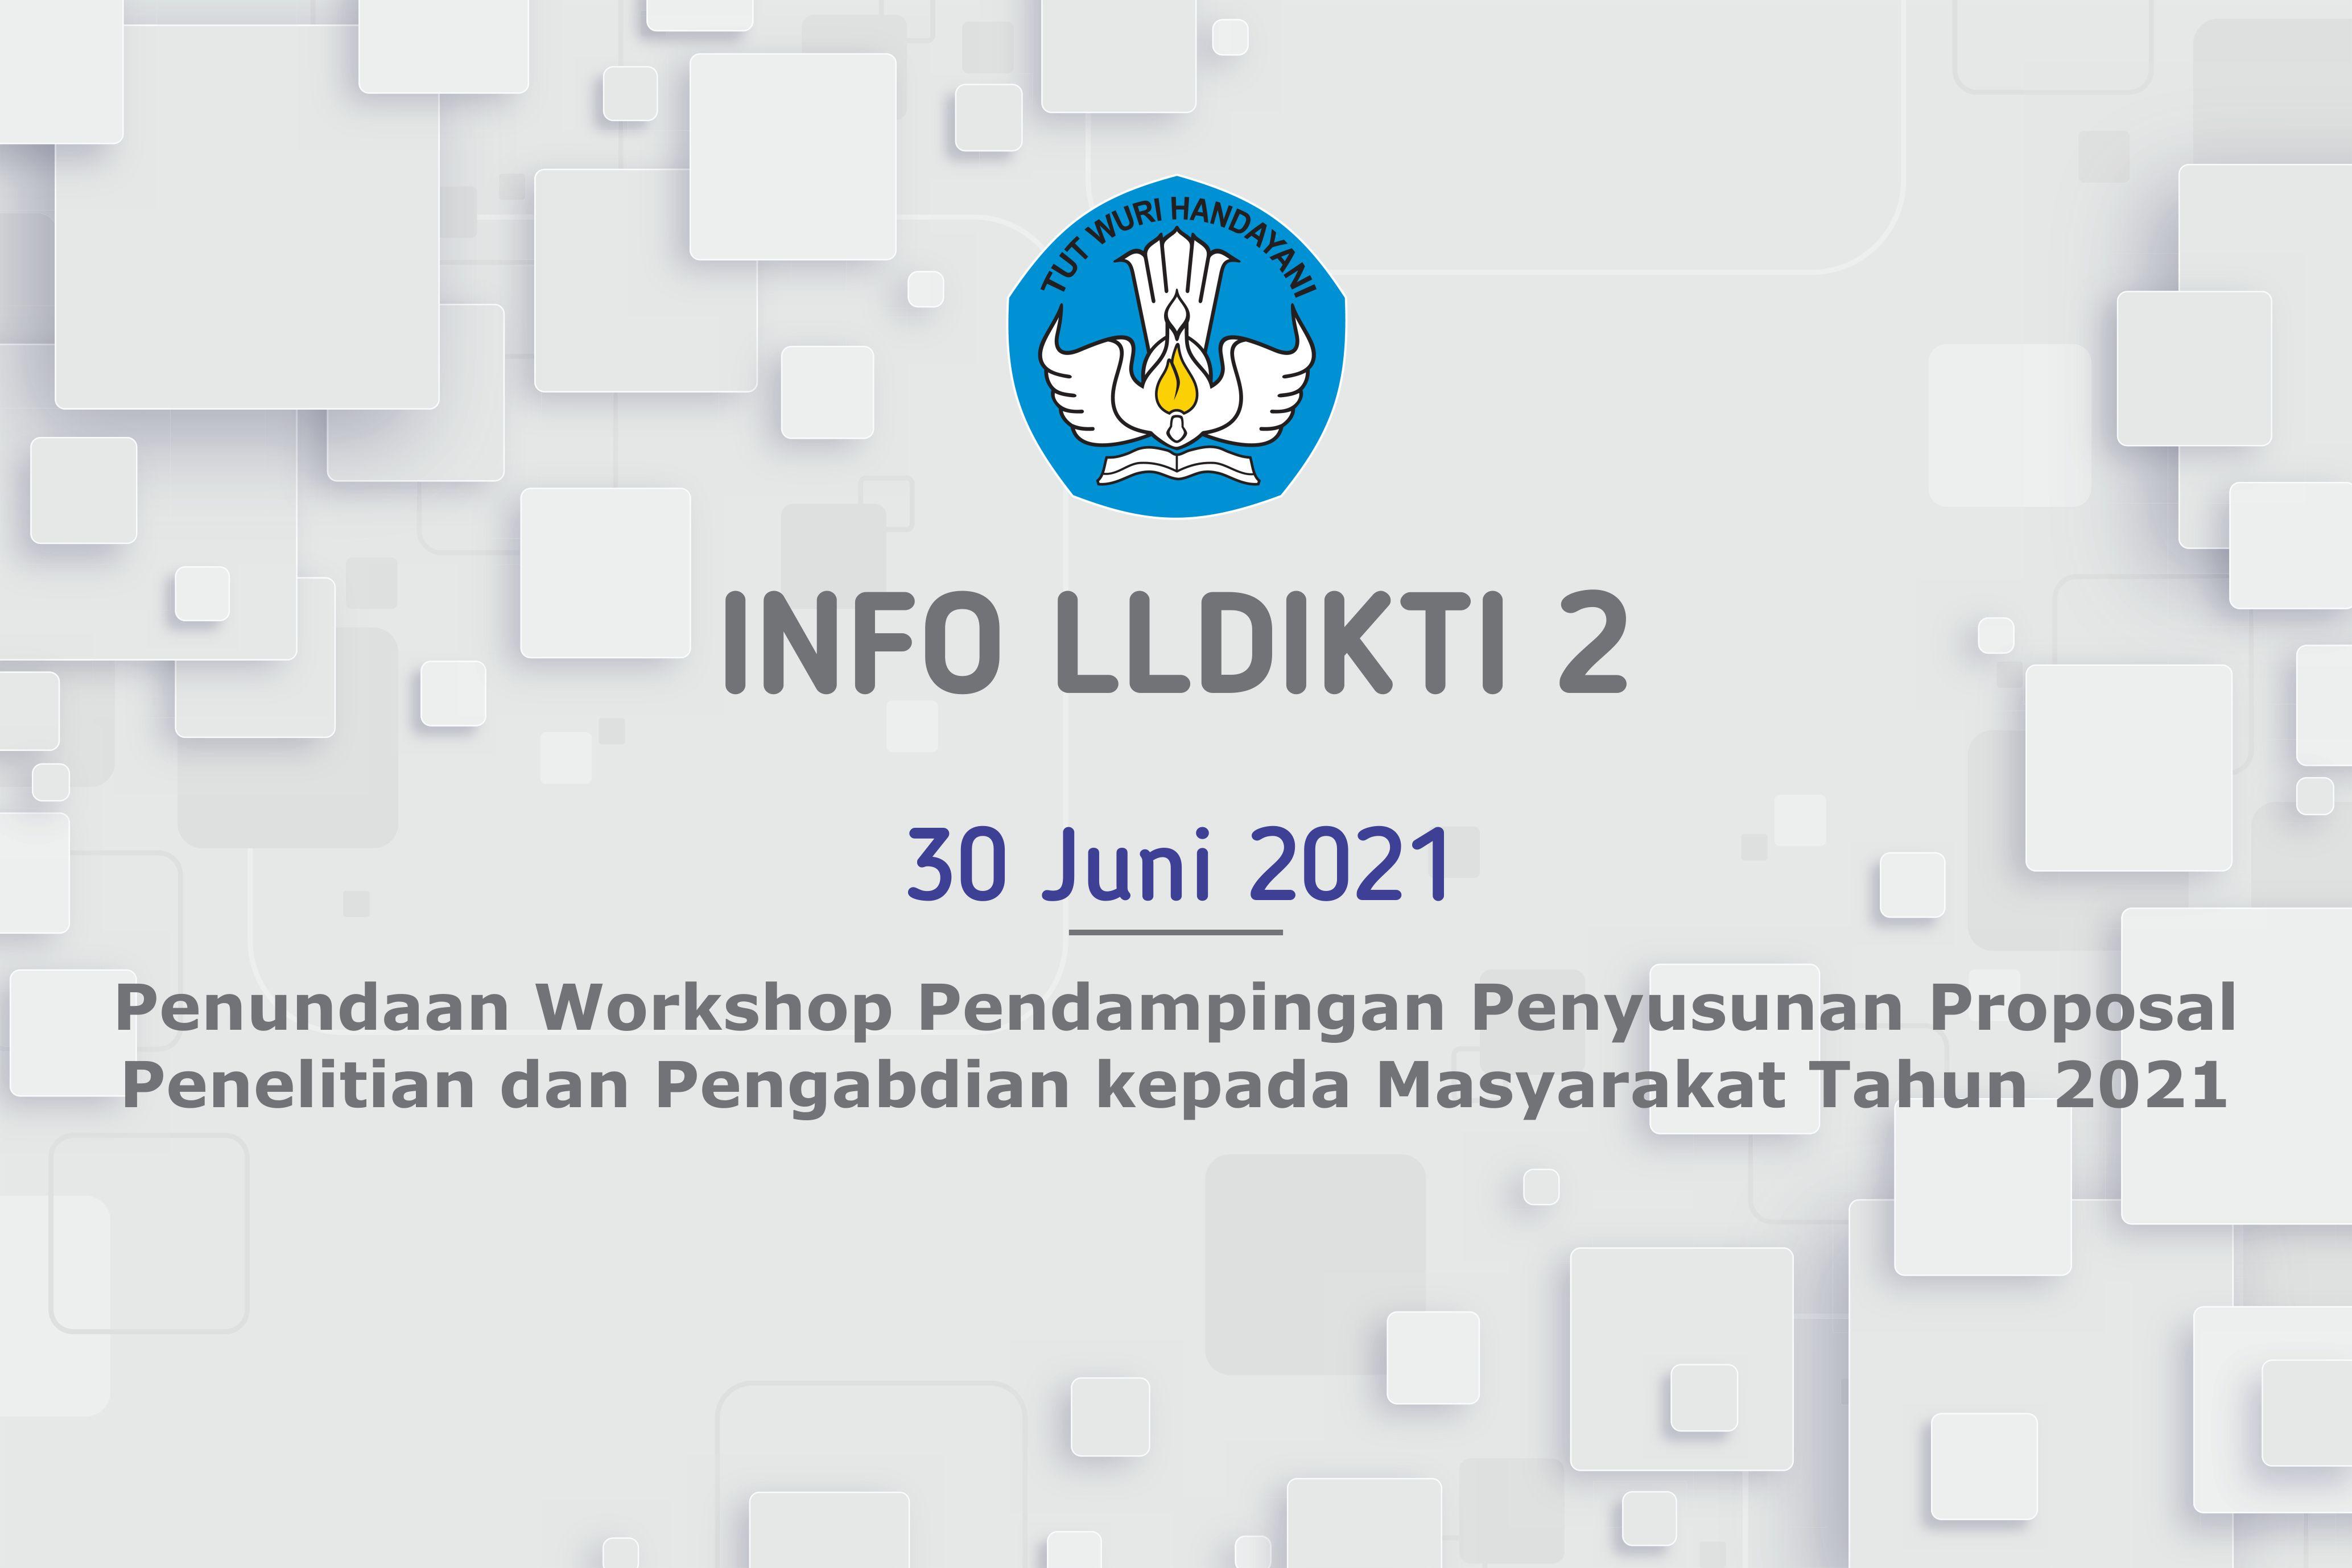 Penundaan Workshop Pendampingan Penyusunan Proposal Penelitian dan Pengabdian Kepada Masyarakat Tahun 2021